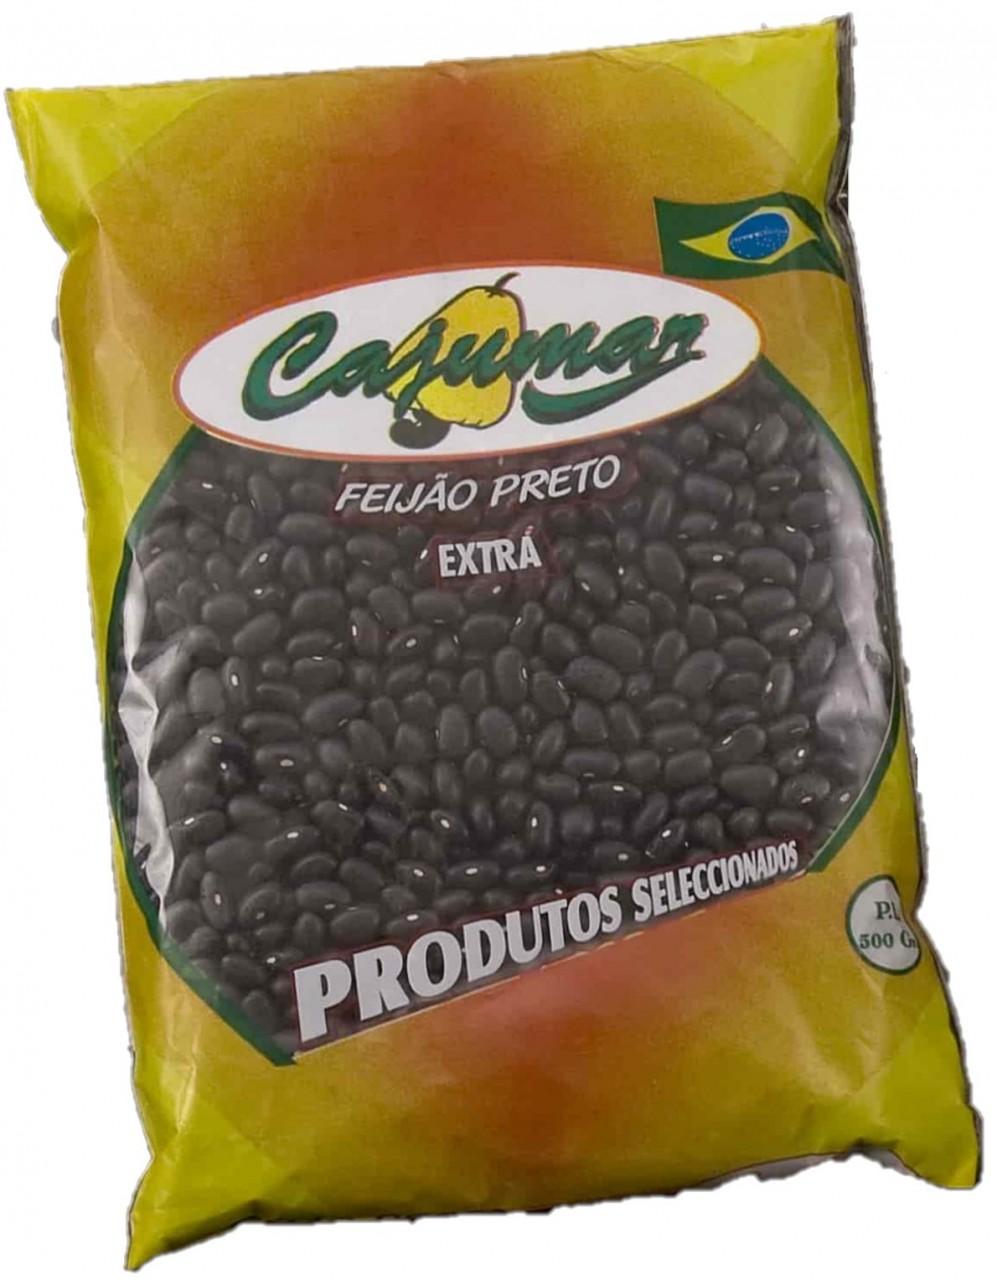 Rohe Schwarze Bohnen - Feijão Preto Seco - Cajumar - Portugal